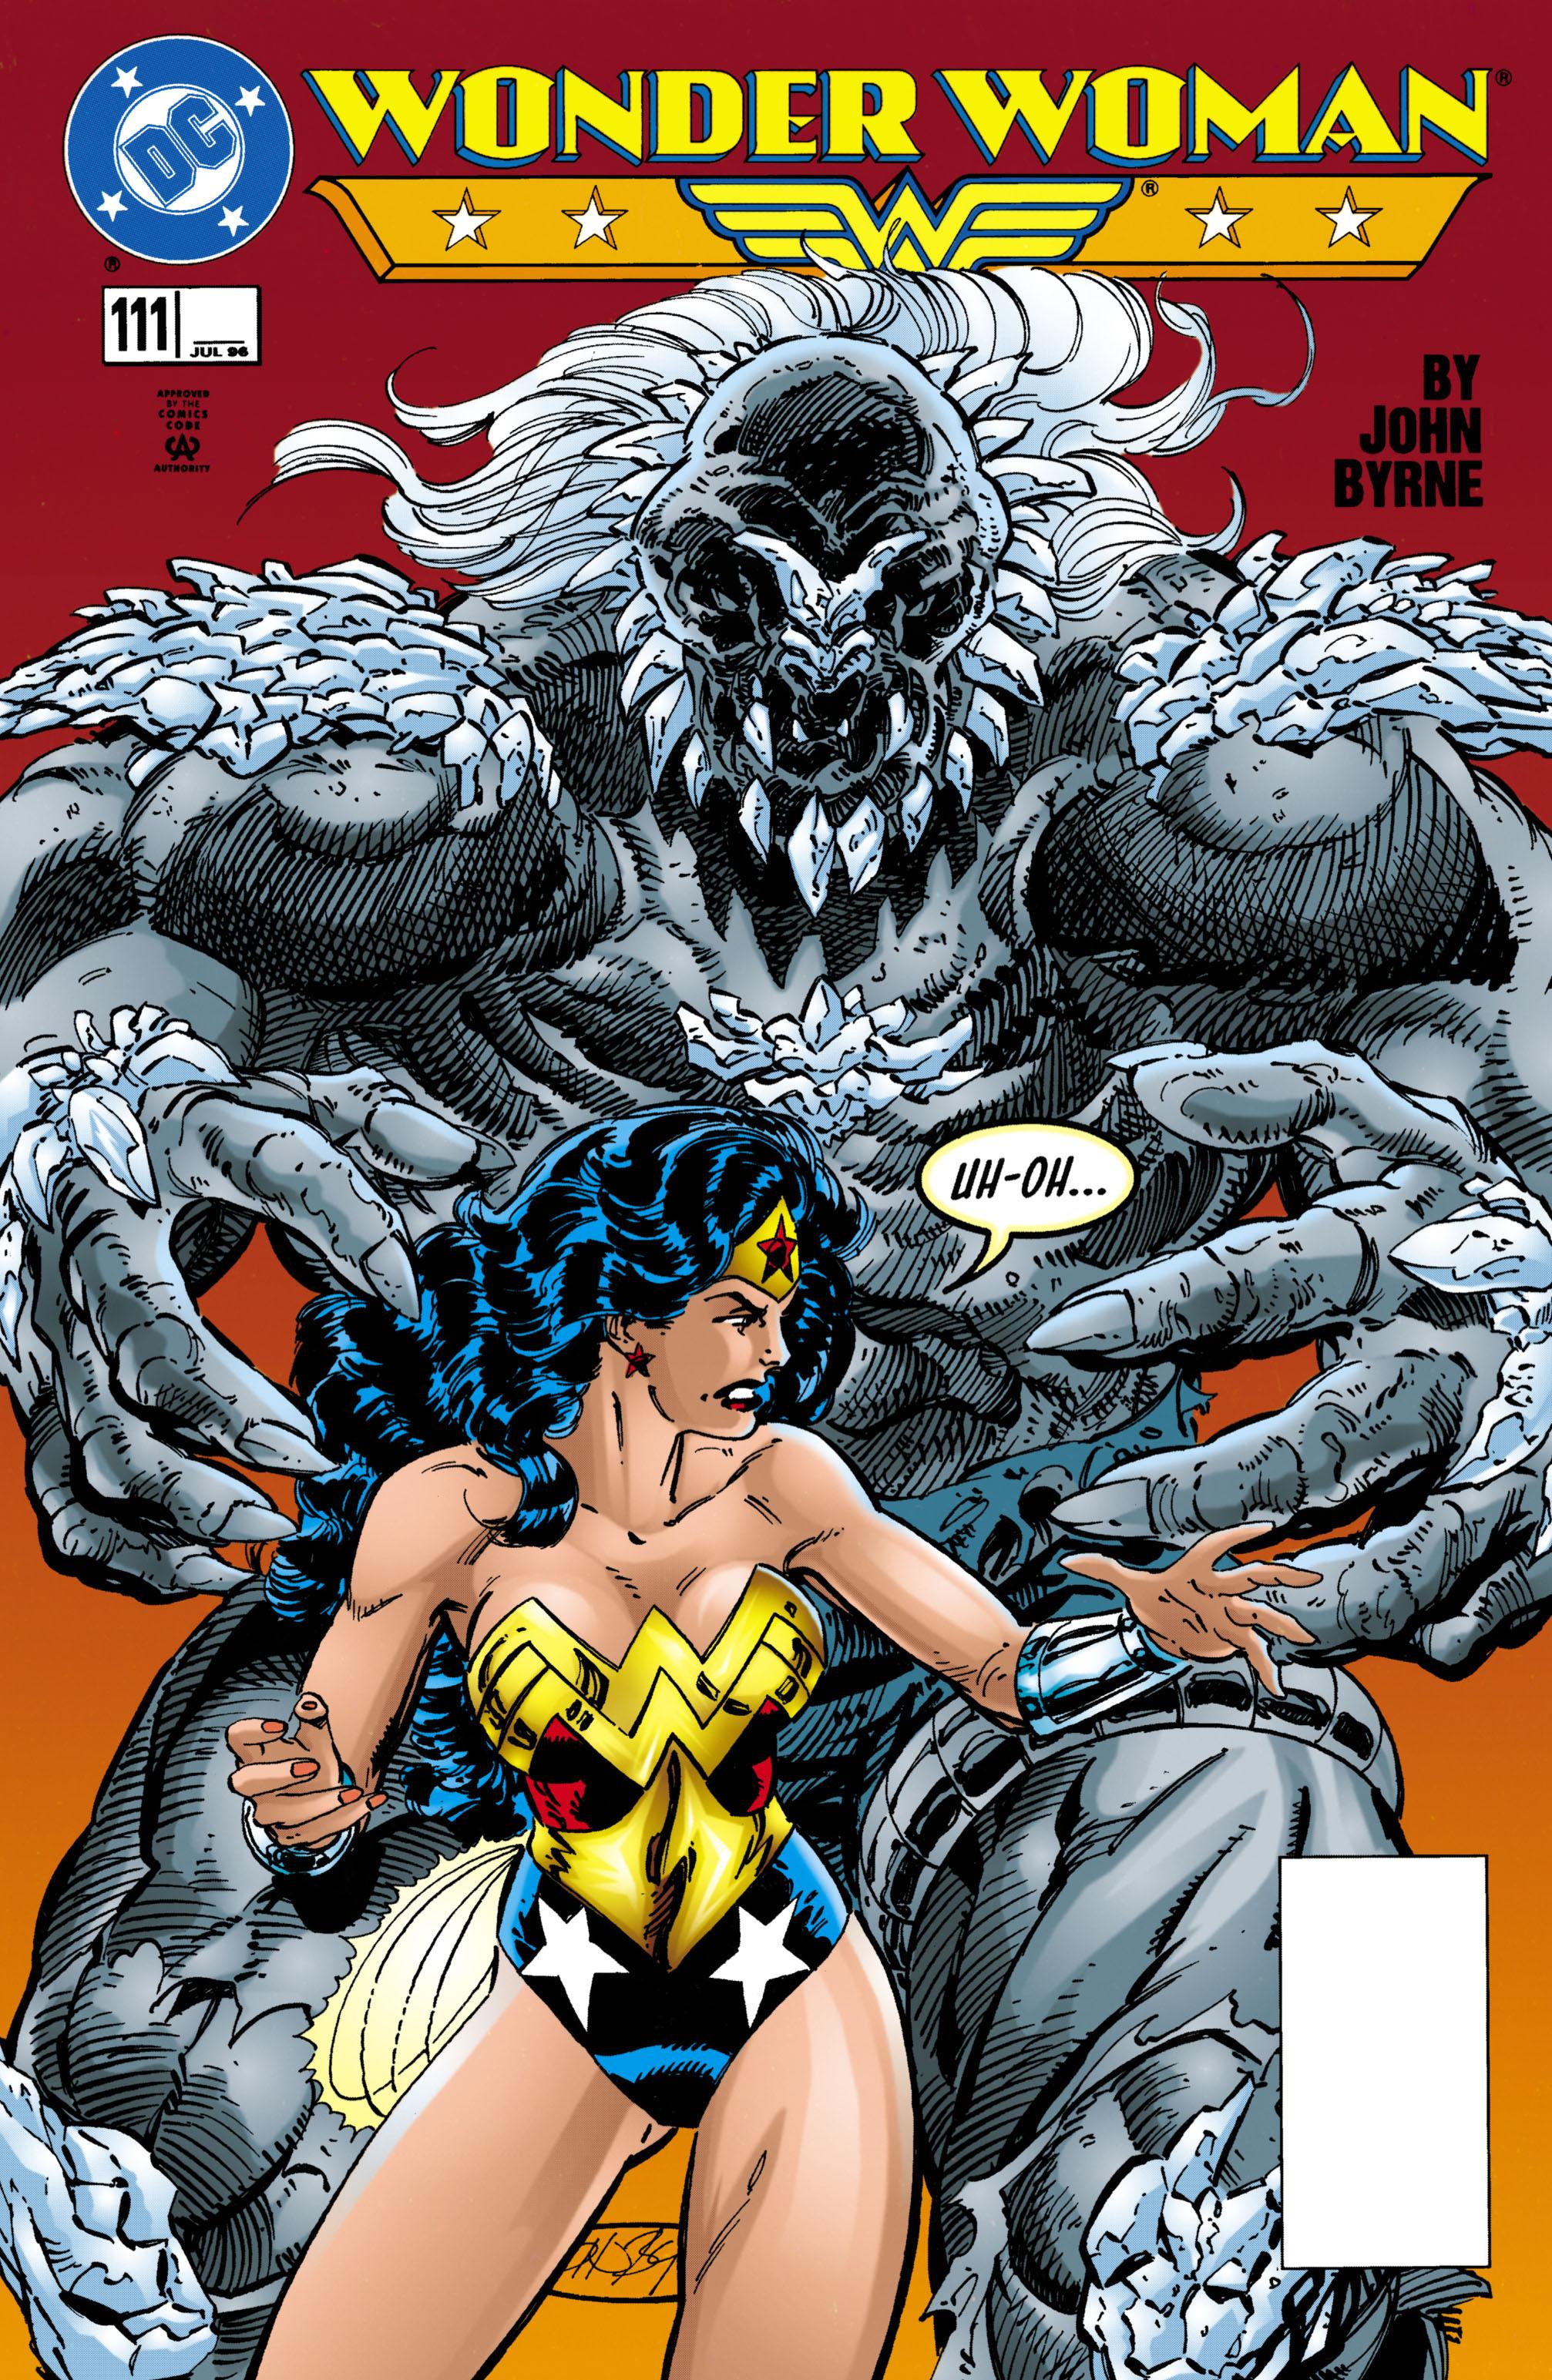 Read online Wonder Woman (1987) comic -  Issue #111 - 1